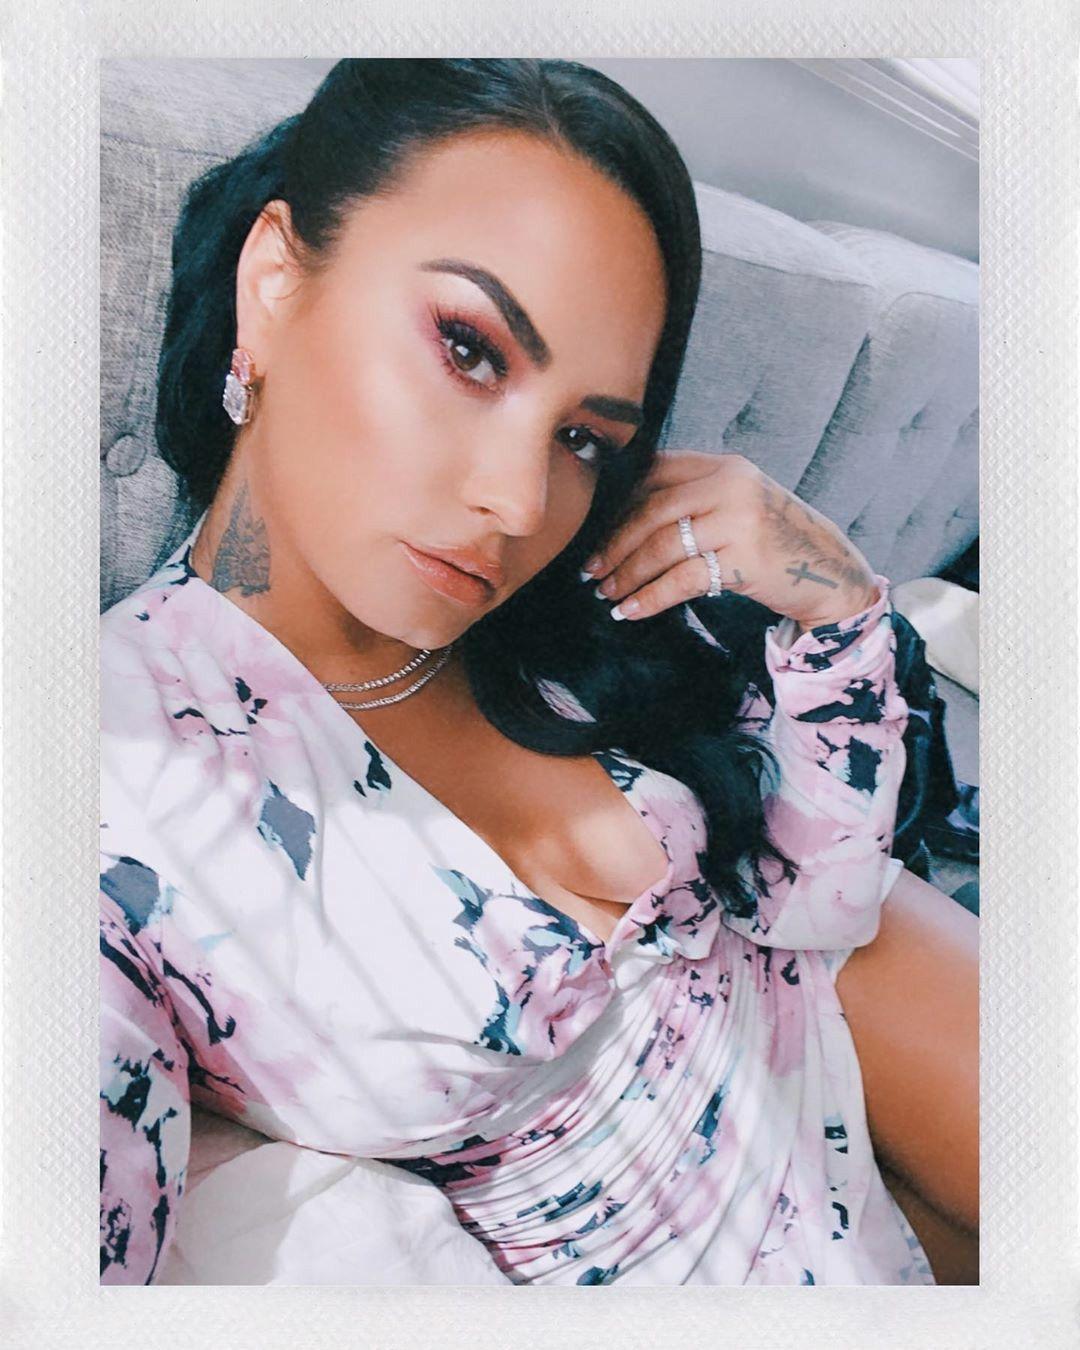 Demi Lovato via Instagram in 2020 Demi lovato, Demi, Lovato